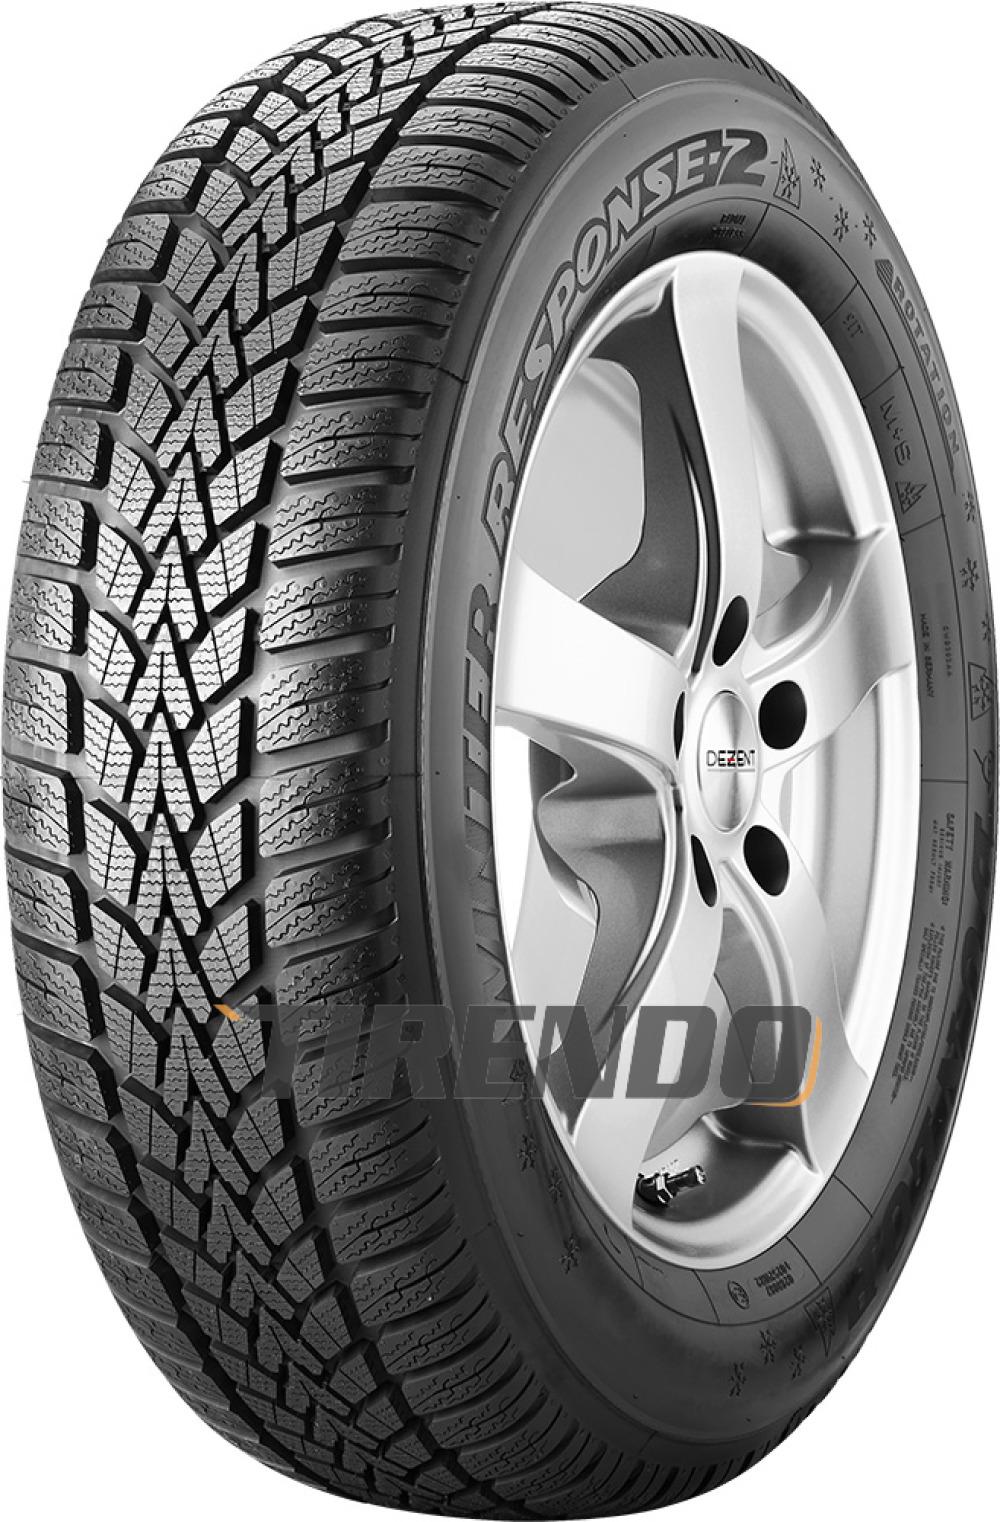 Dunlop SP Winter Response 2 ( 165/65 R15 81T )